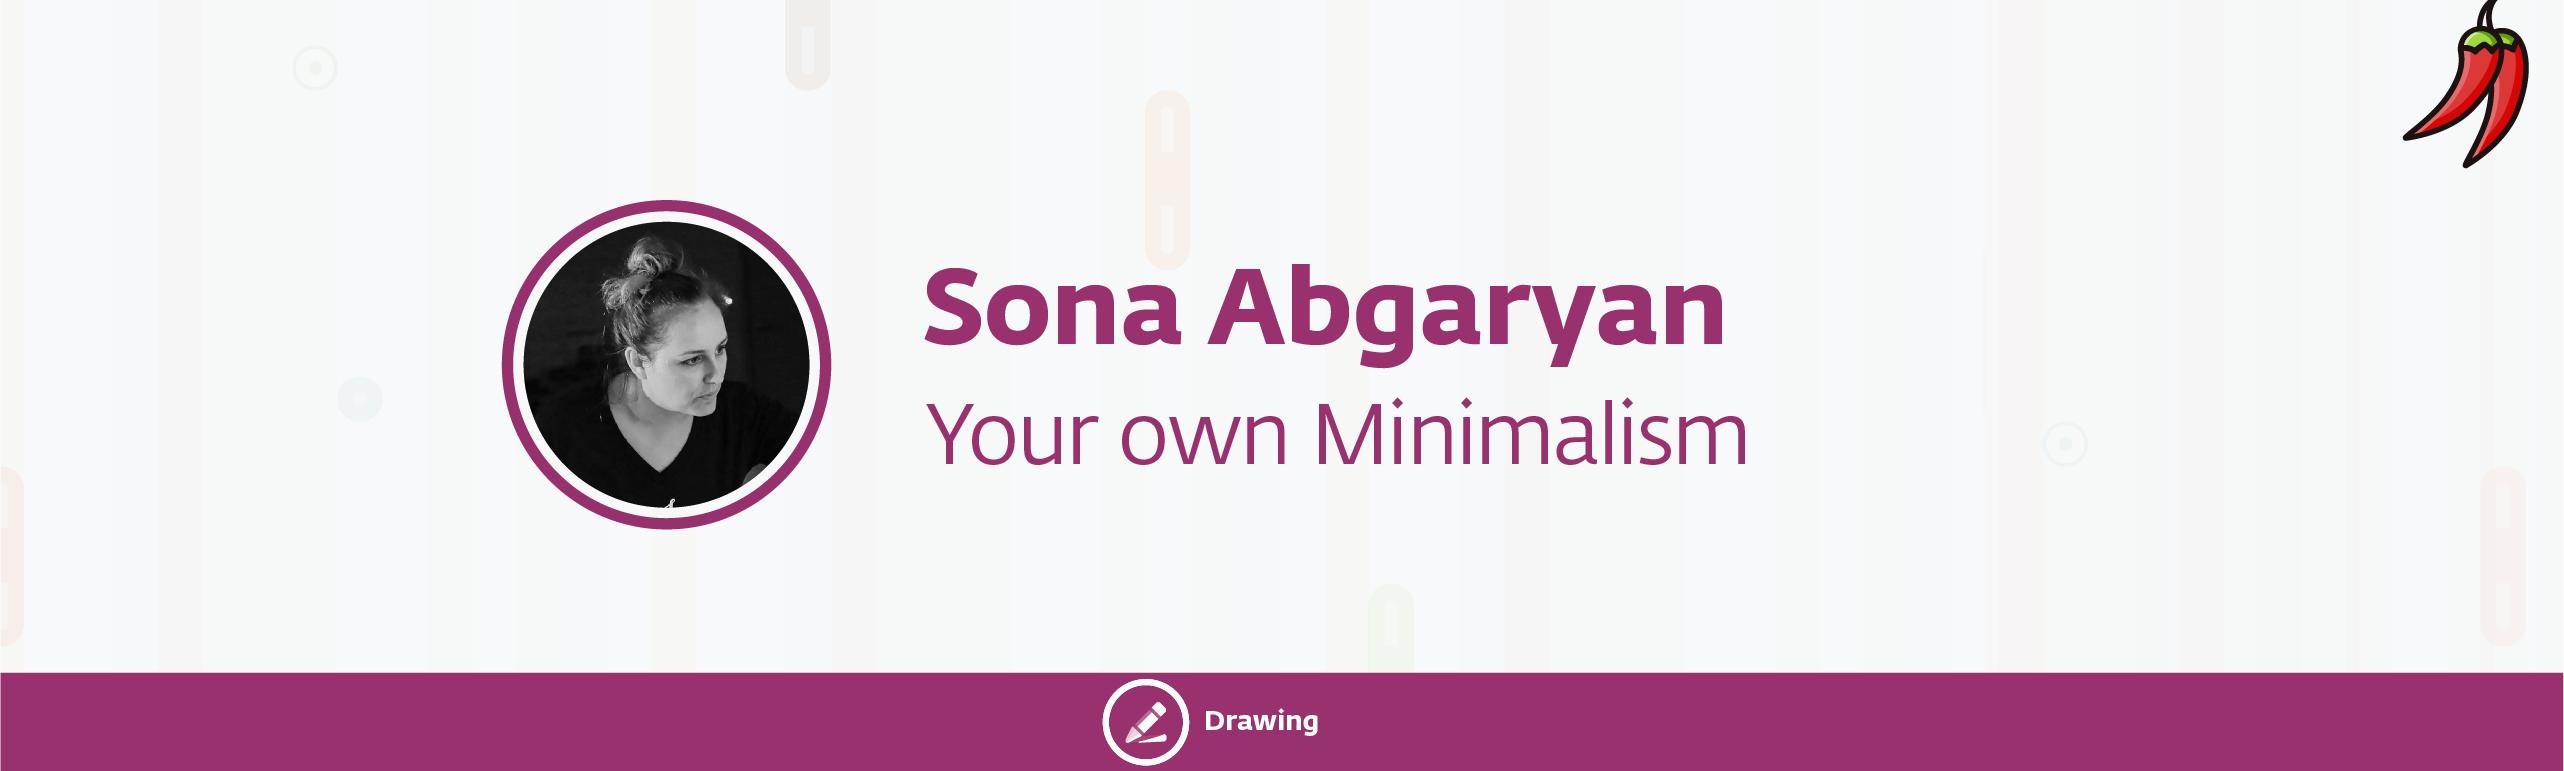 workshop03 - Your own minimalism